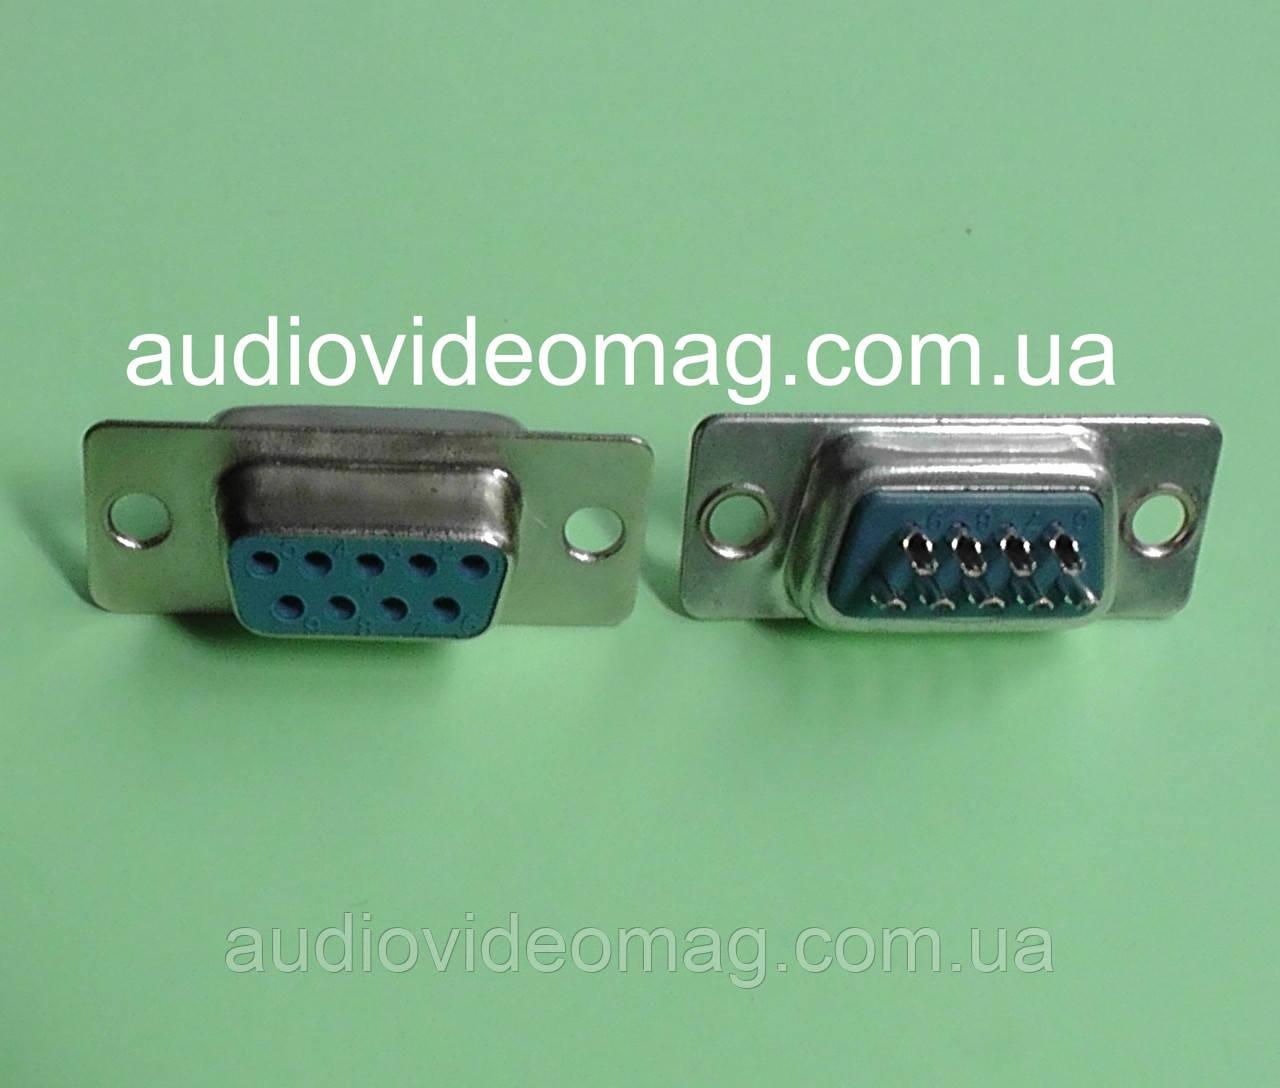 Разъем D-SUB 9 pin DB9-F (мама)